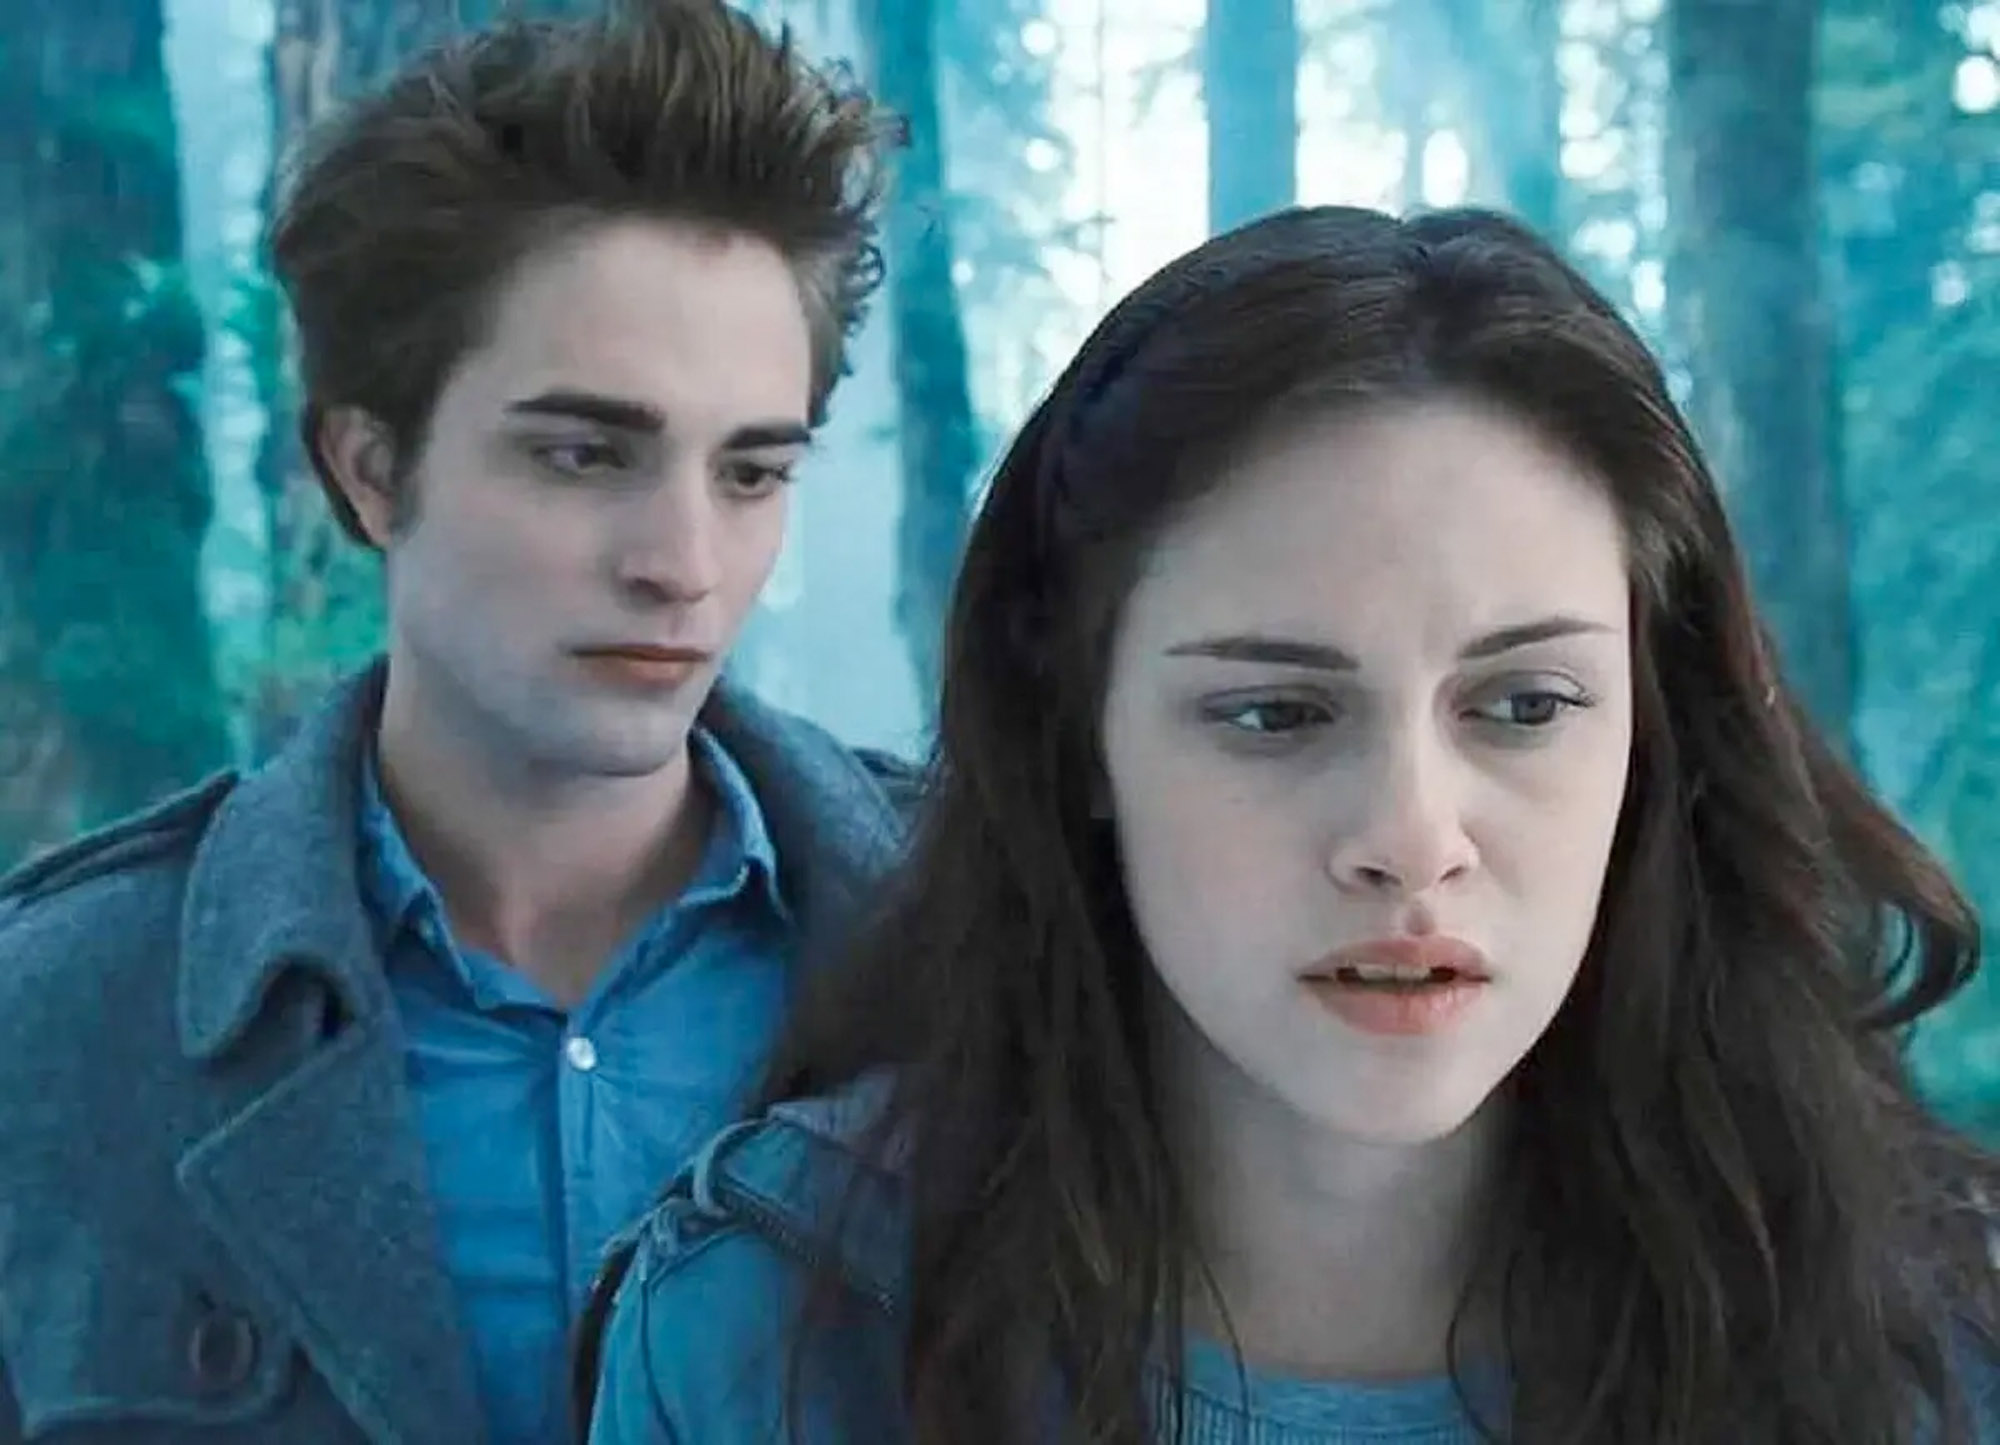 Toxic Twilight? Historien om Ed og Bella fortelles på nytt (Summit)